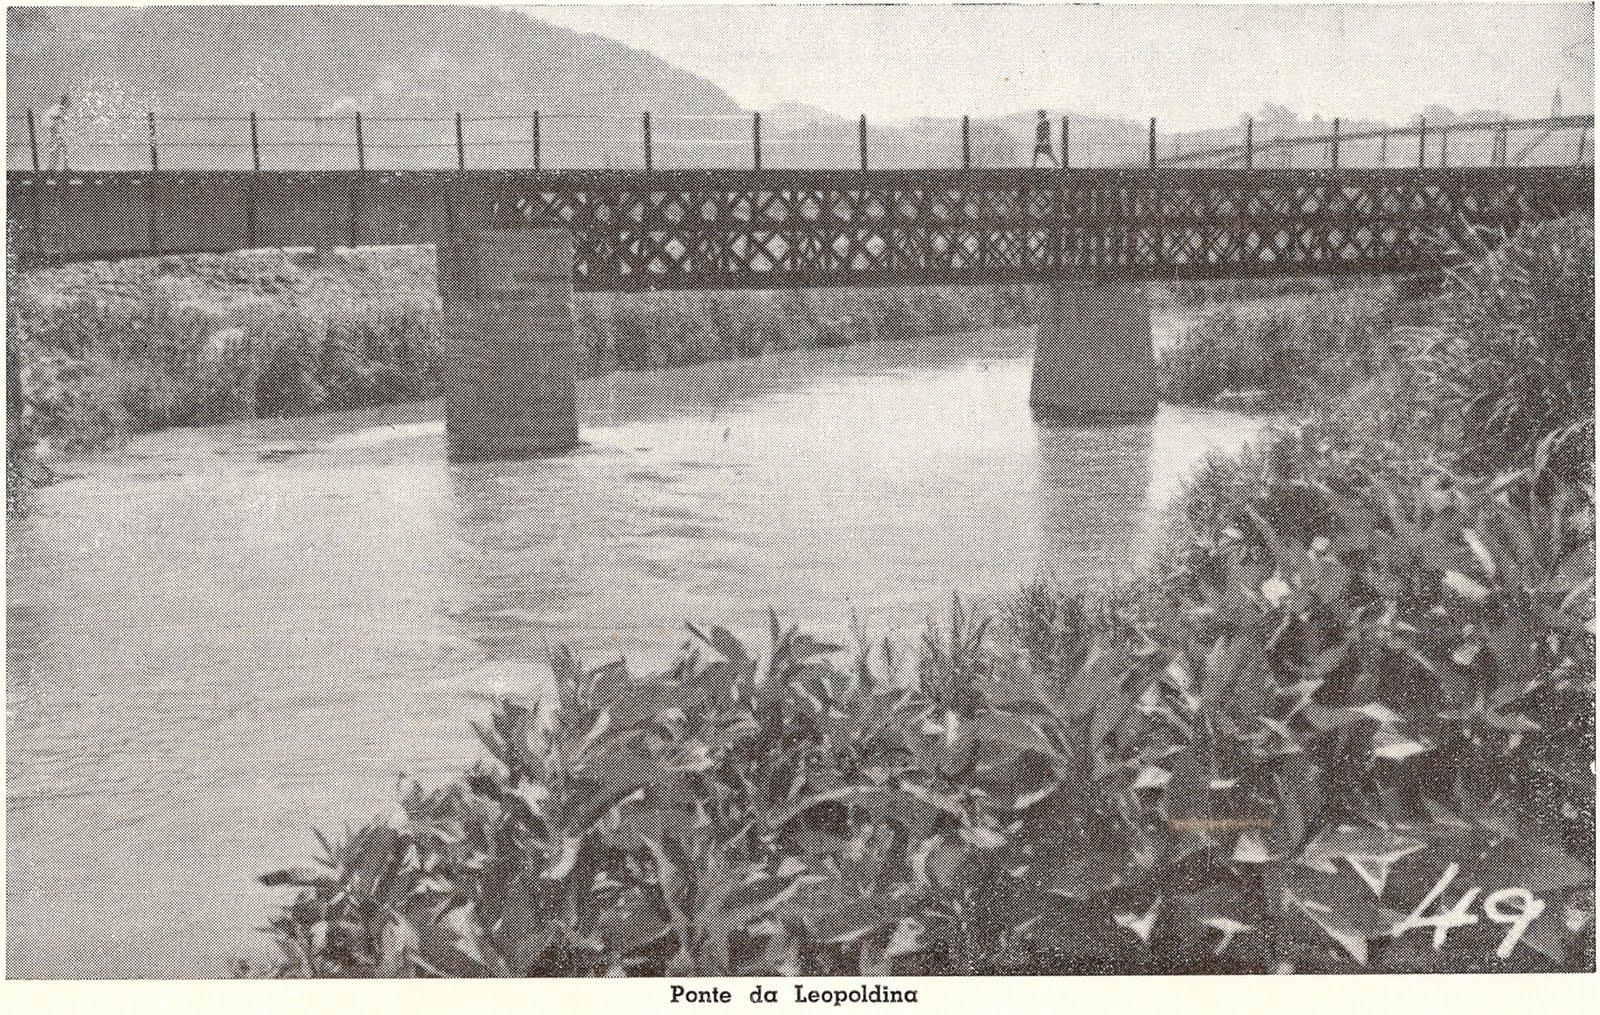 http://1.bp.blogspot.com/_uQcmeZg5oUI/S9XetEvVhII/AAAAAAAAB8I/3fqEU5On23I/s1600/Ponte+da+Leopoldina+1943.jpg